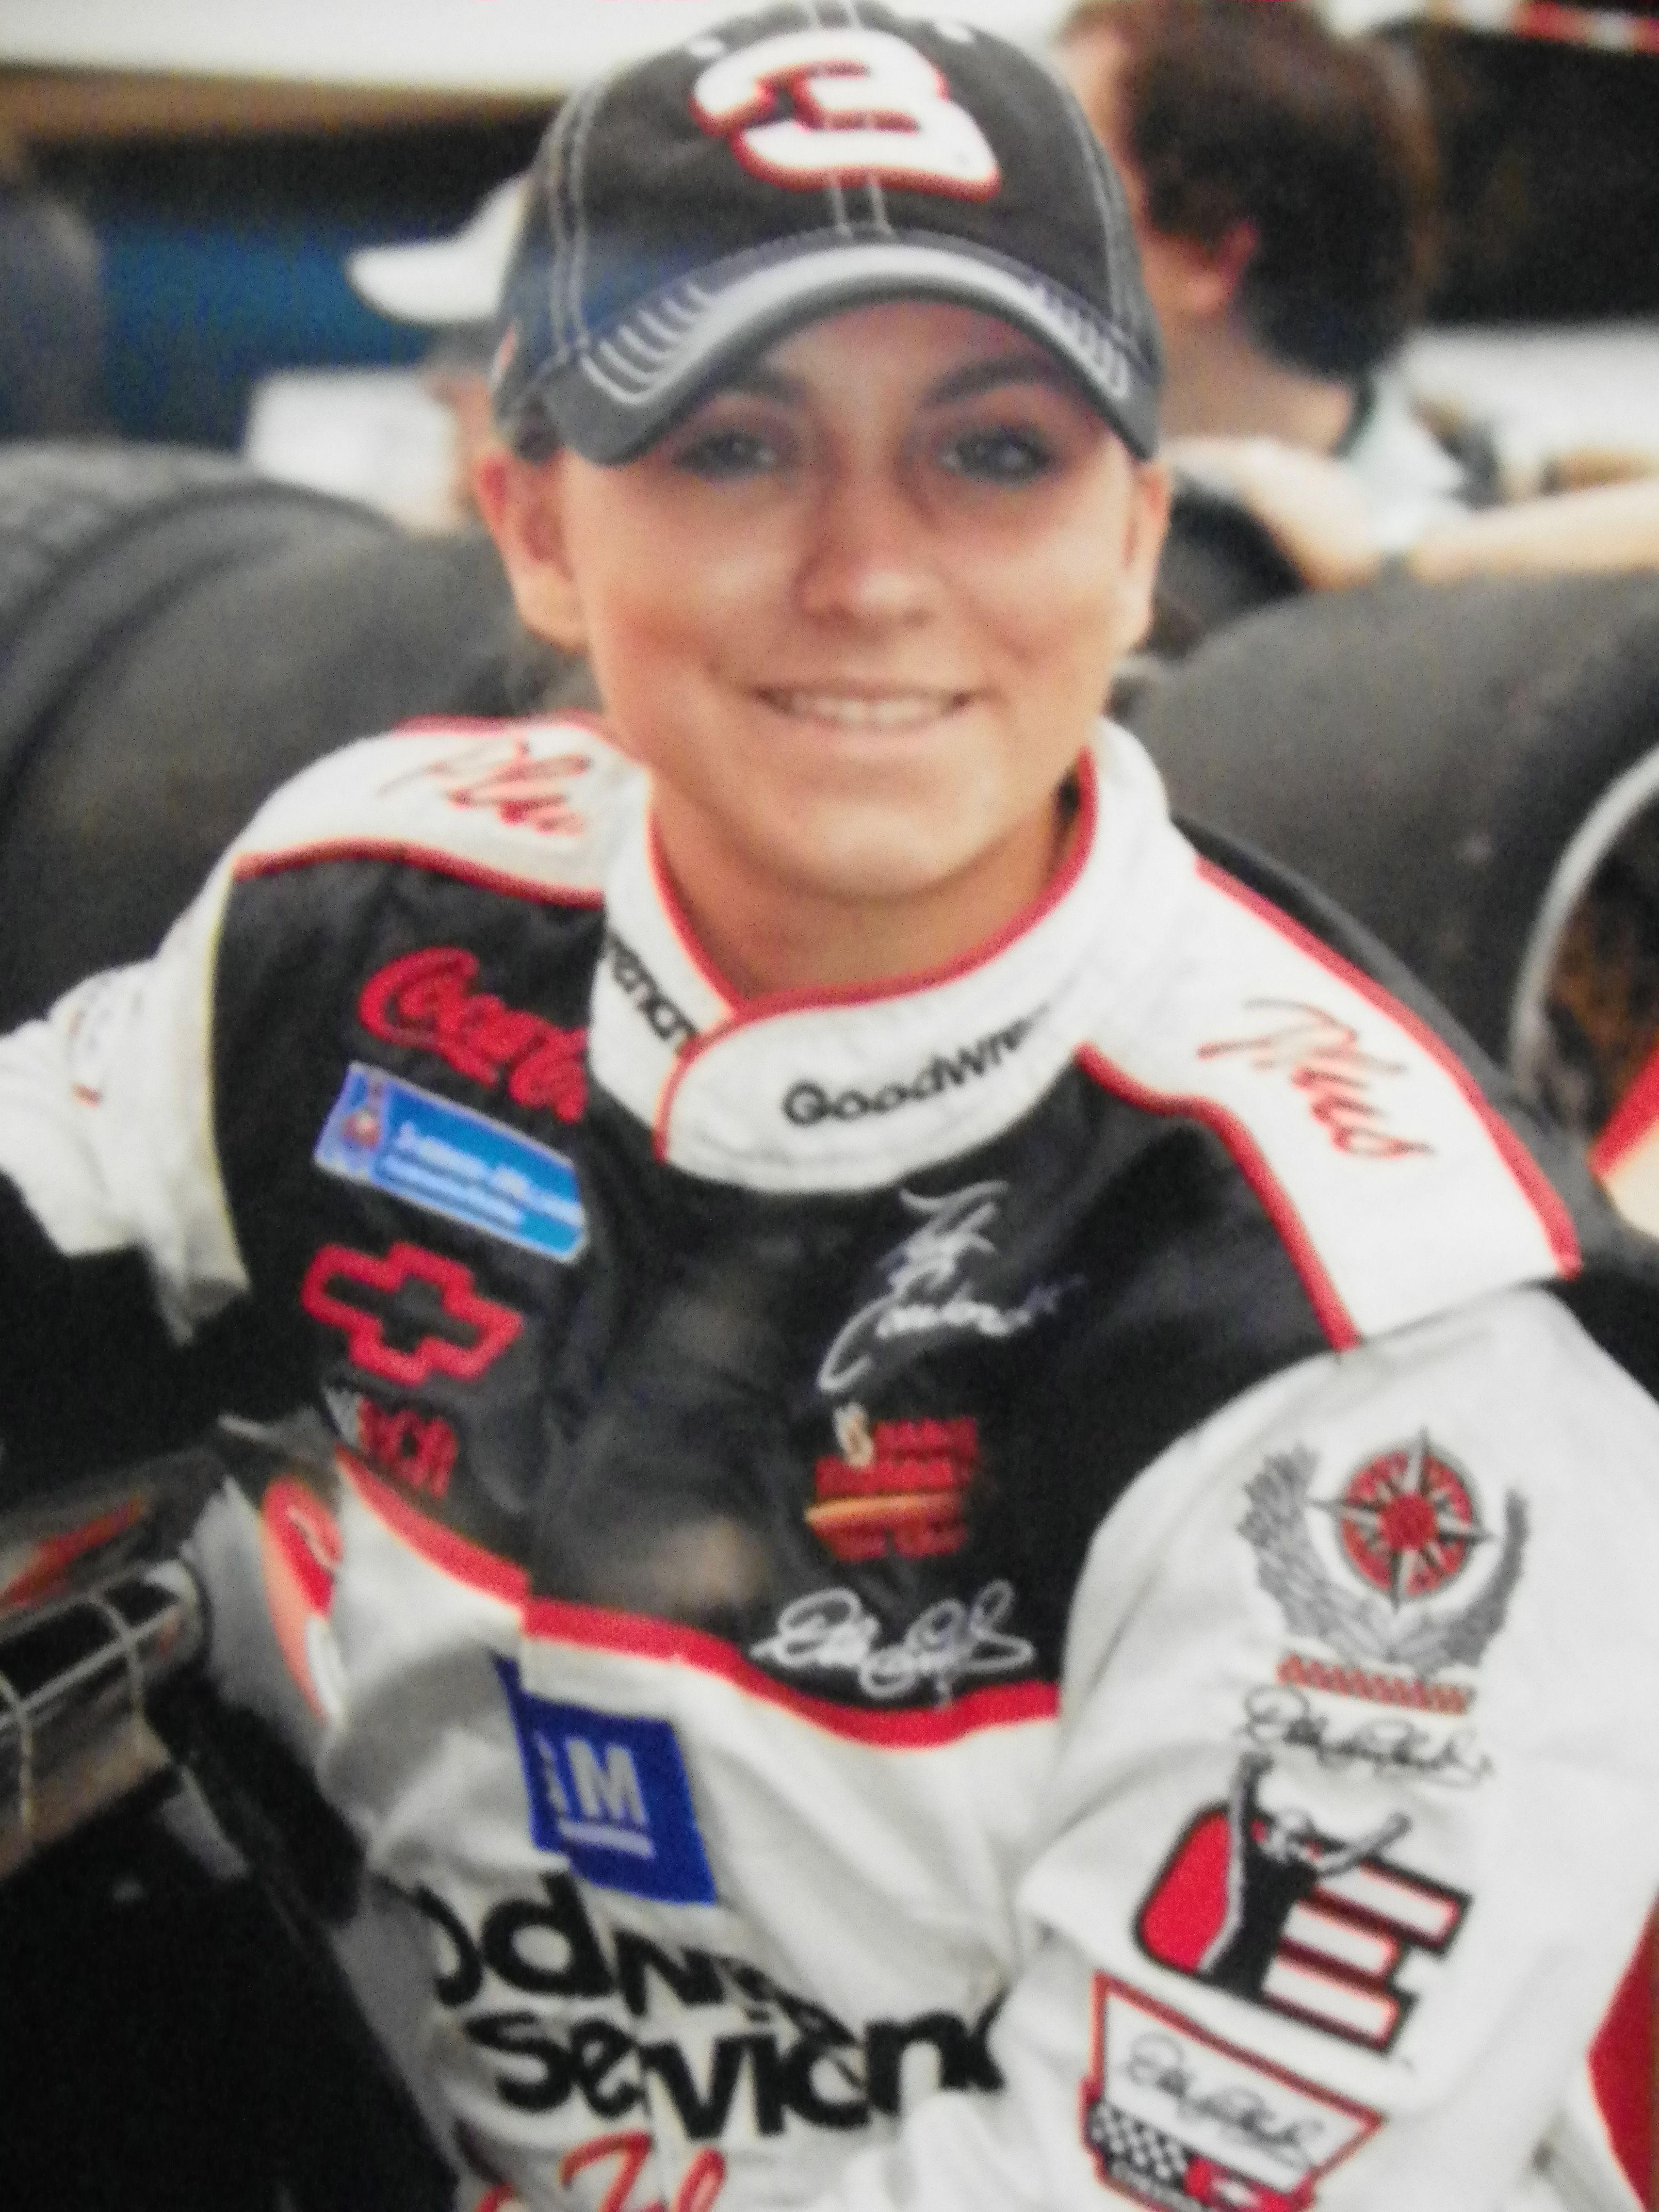 Taylor Nicole Earnhardt Nascar Race Cars Nascar Racing Dale Earnhardt Brandon samuel putnam in mooresville, north carolina. pinterest